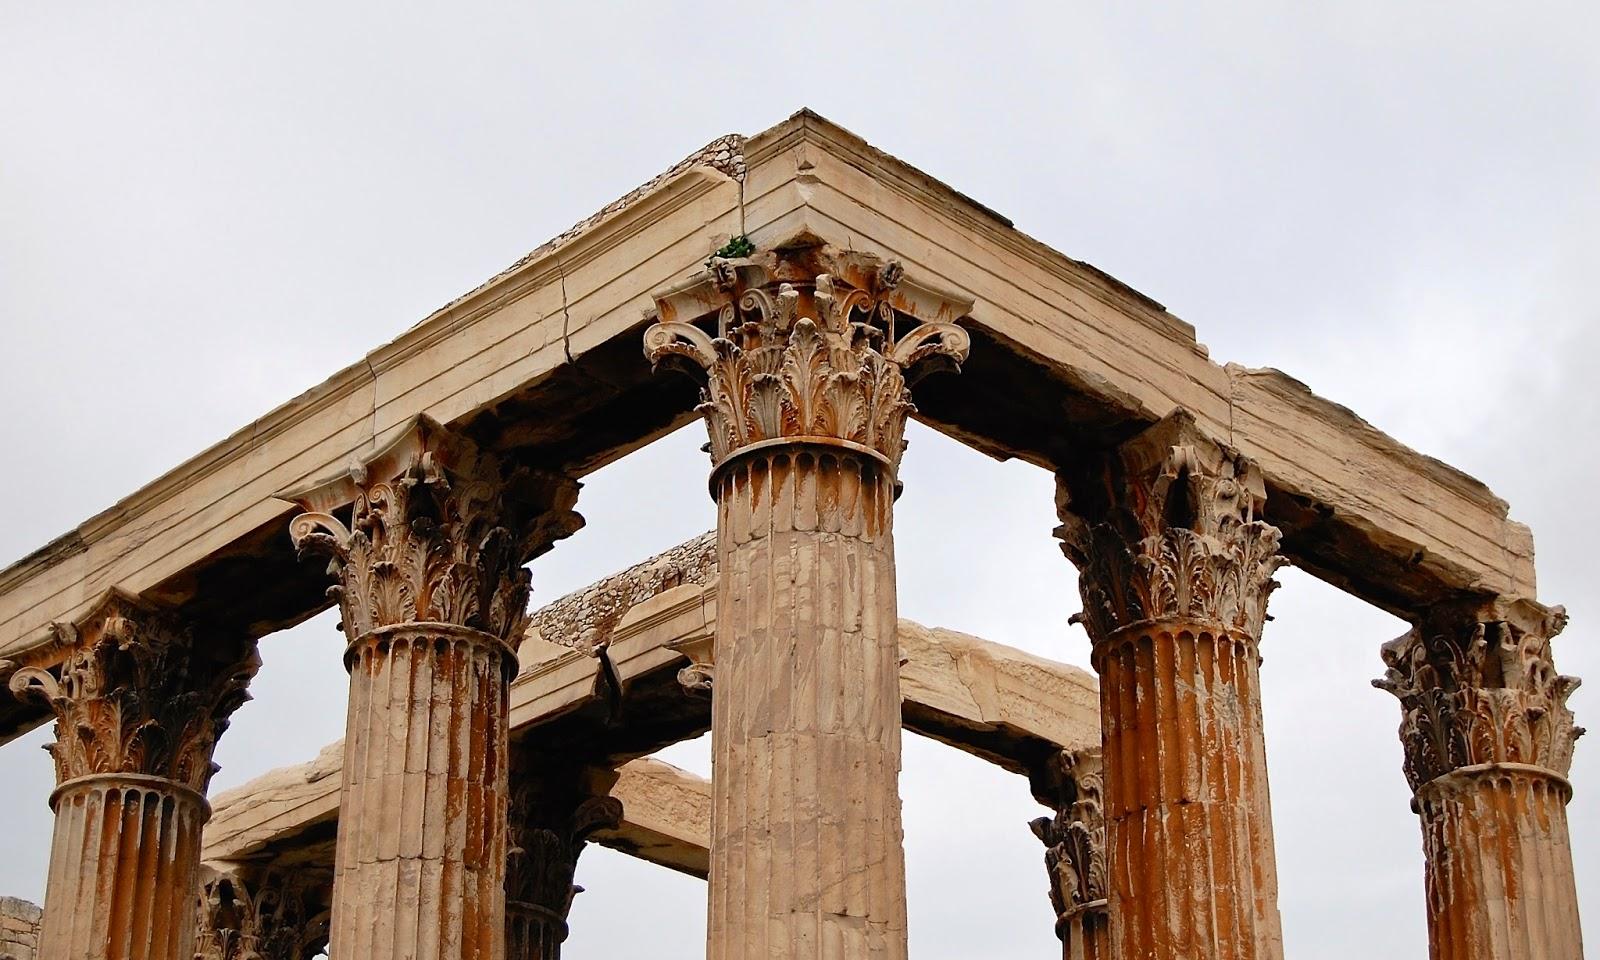 Corinthian capitals on the Temple of Olympian Zeus